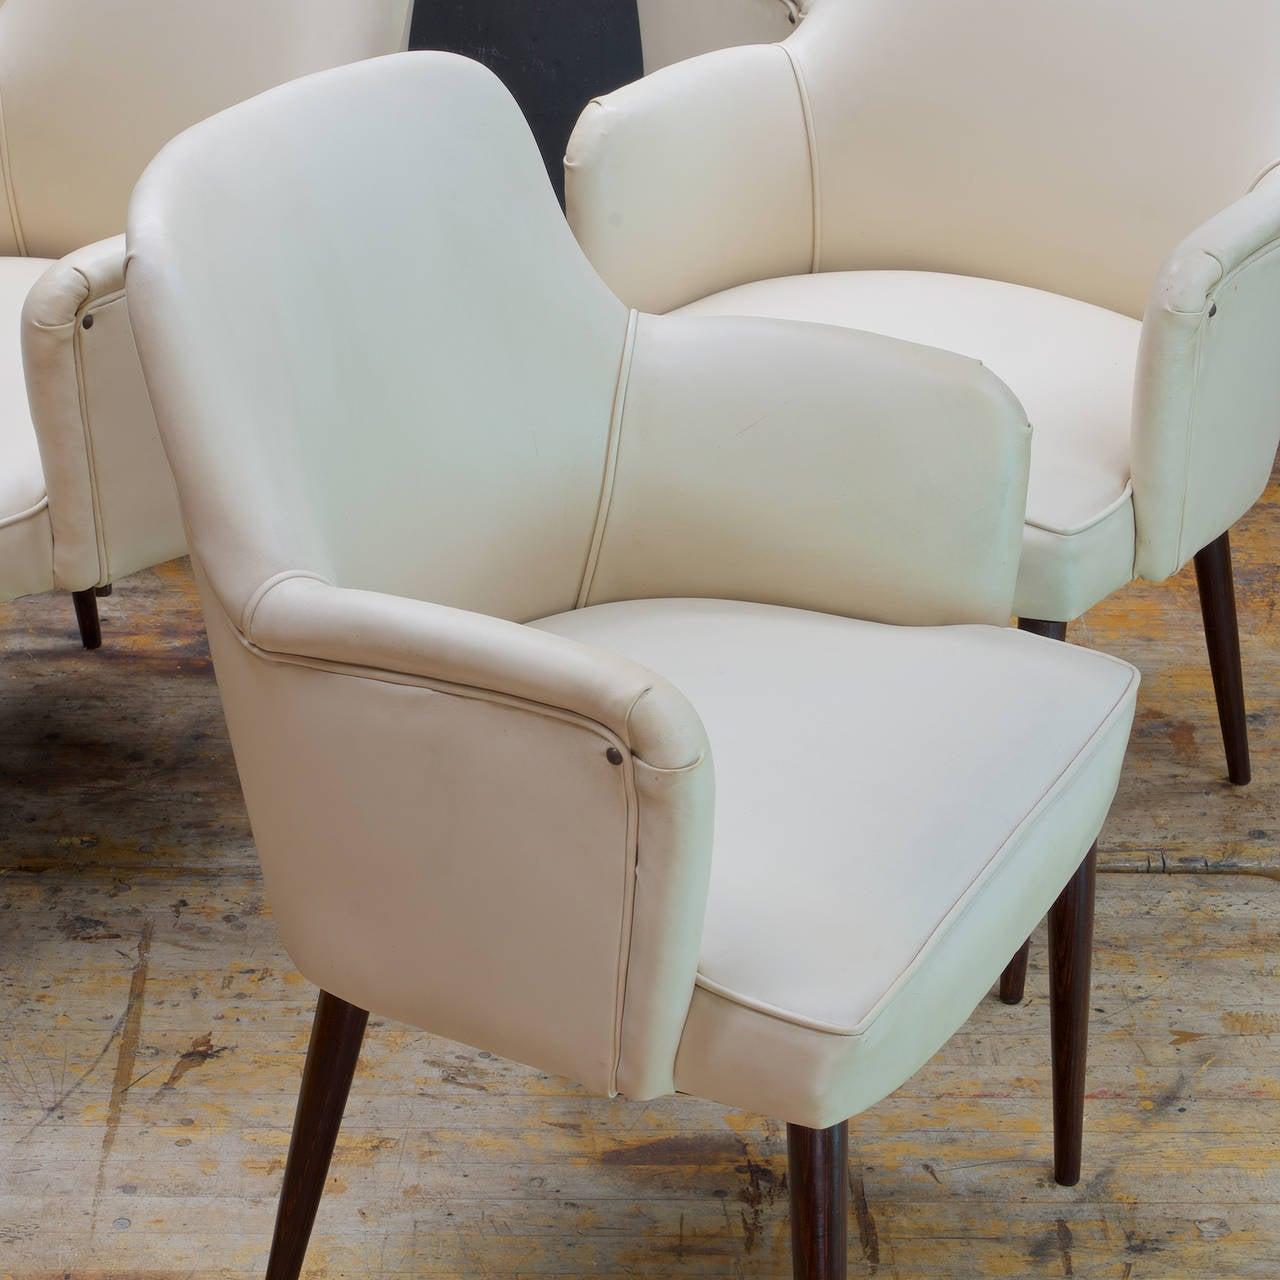 Five, 1950s Mid Century Italian Borsani Style Pencil Leg Arm Chairs 3